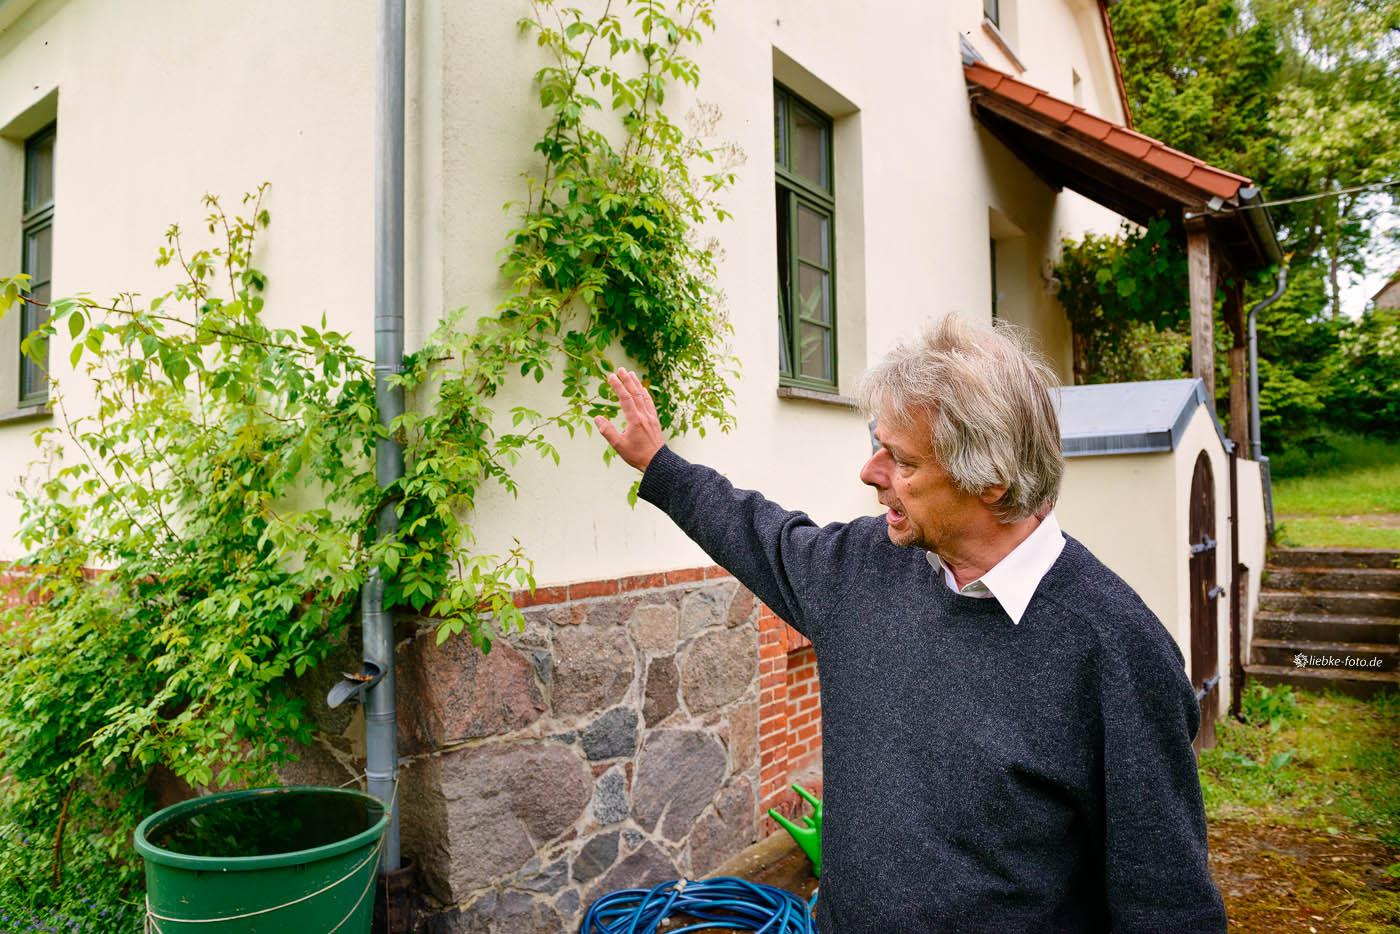 Pastor Ulrich Kasparick an der Kletterrose am Haus